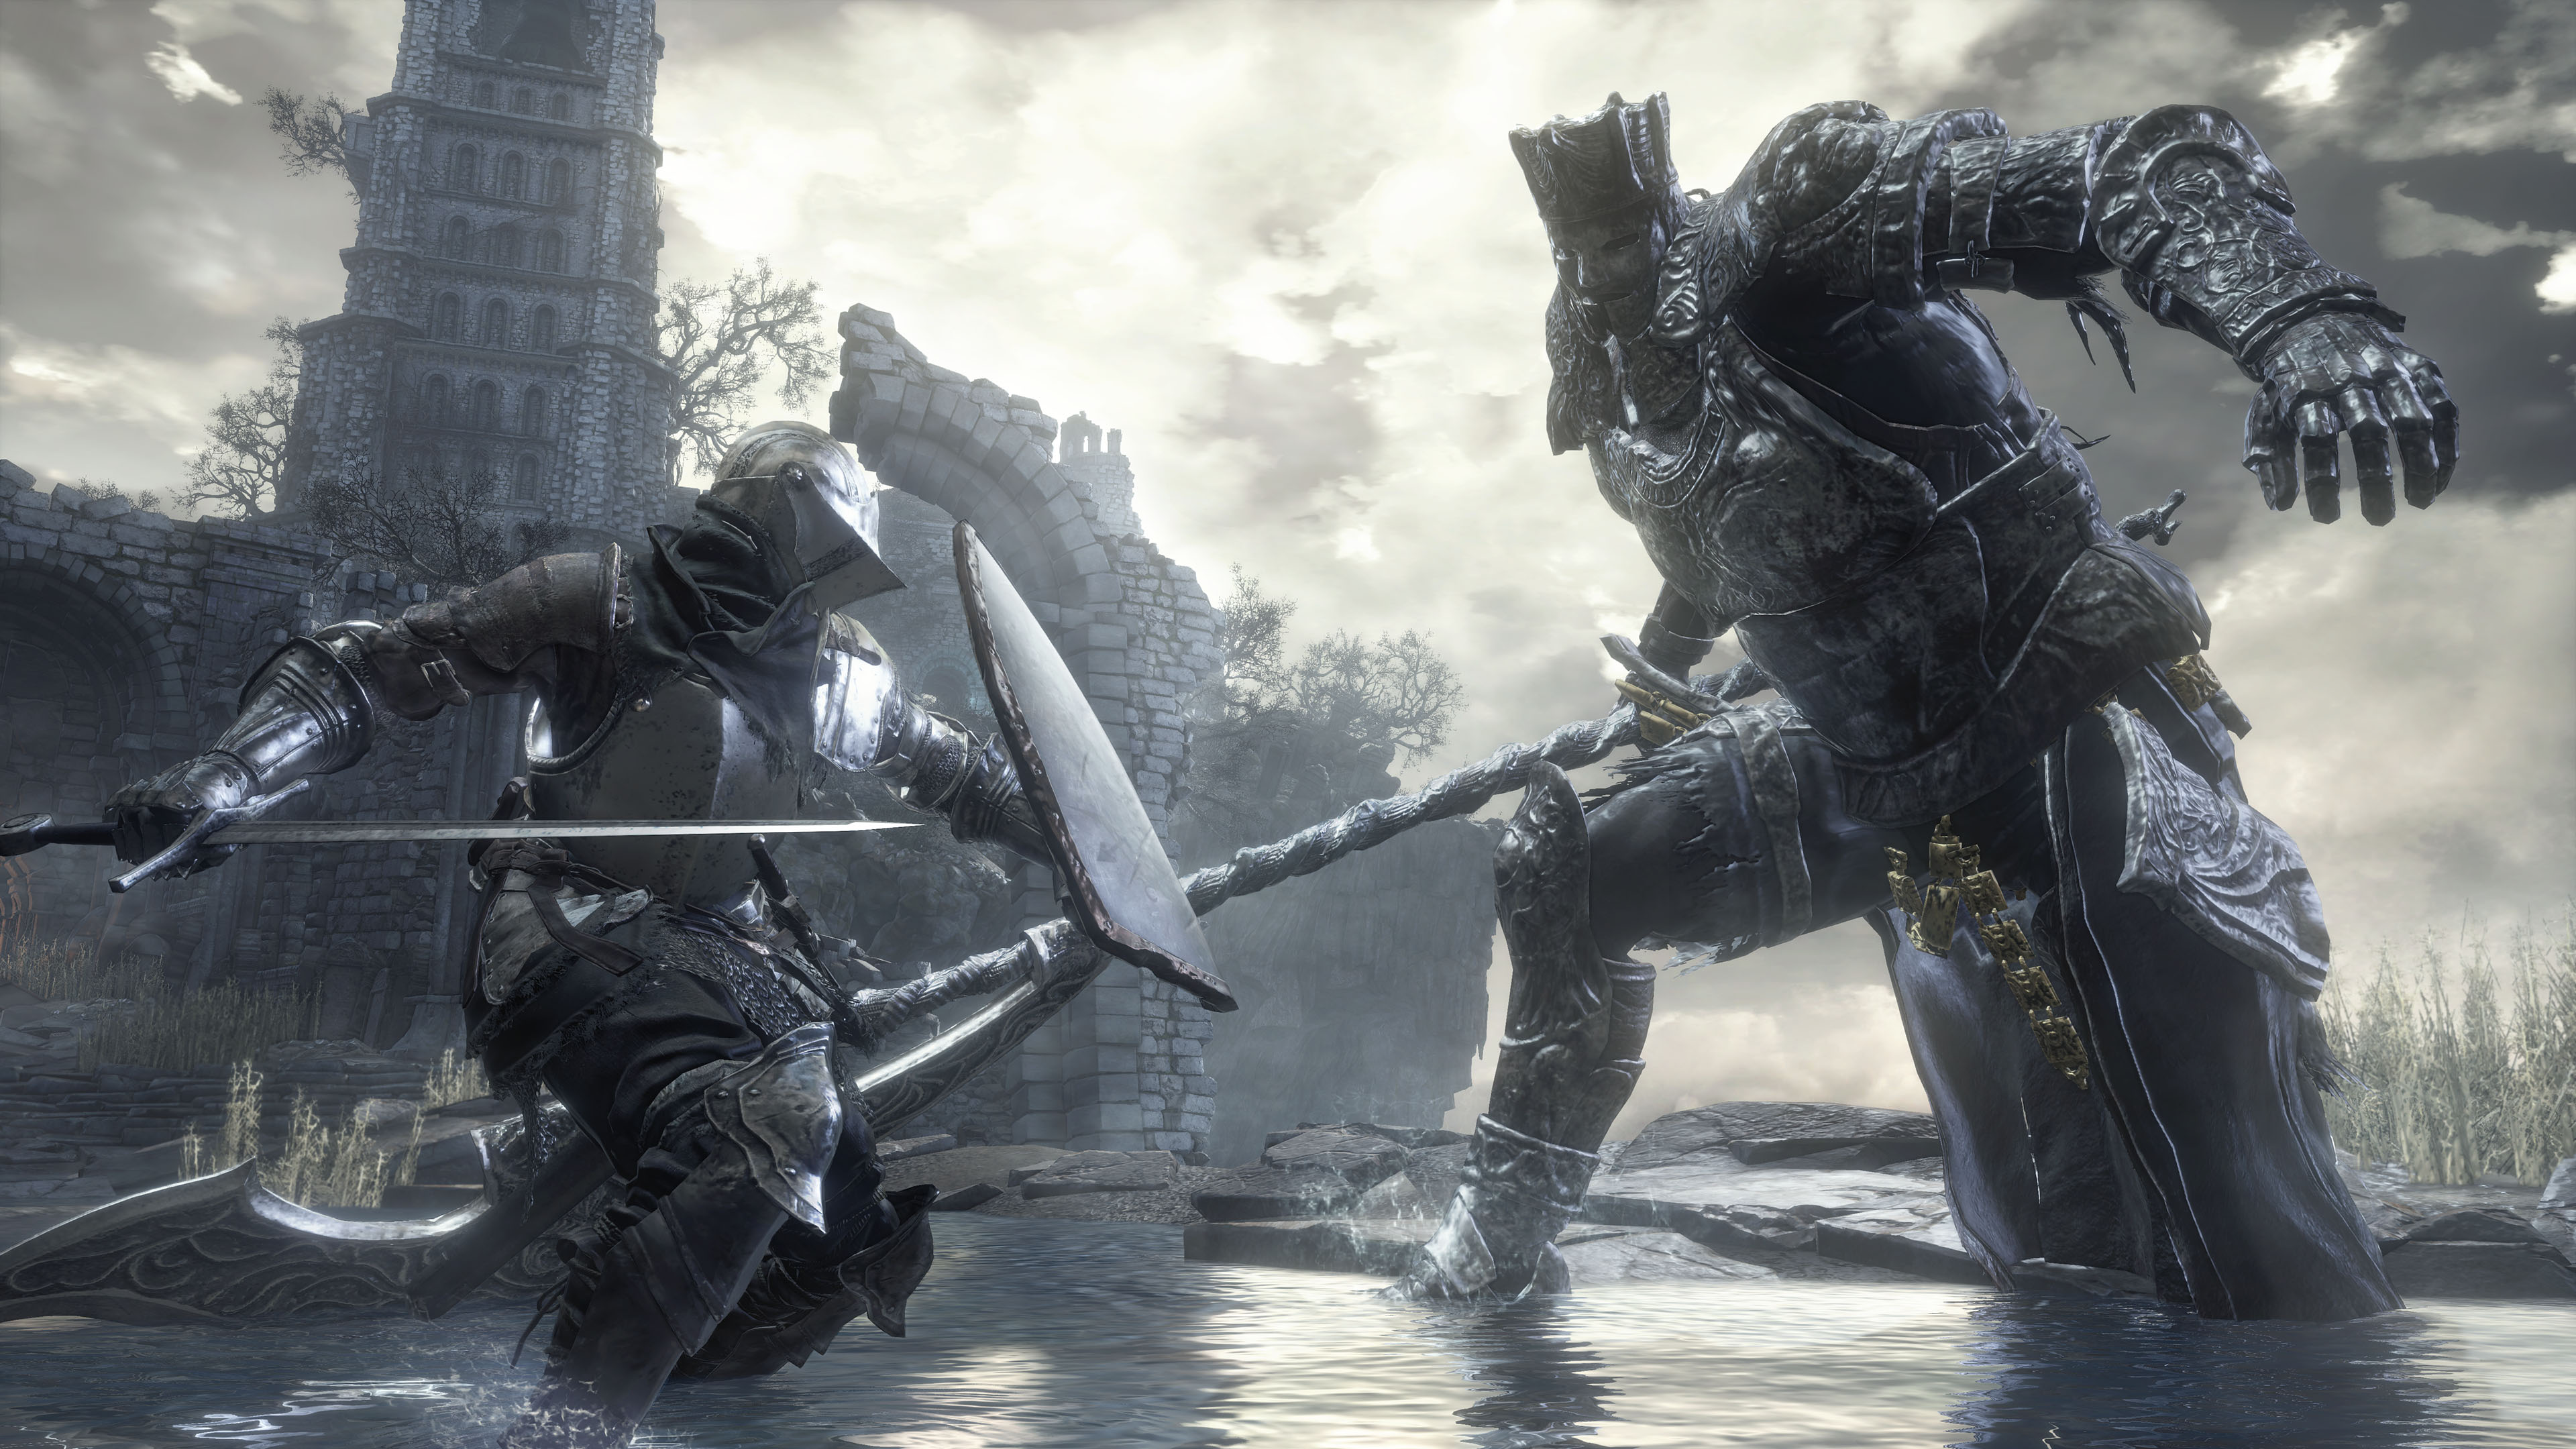 Dark Souls III 4k Ultra HD Fond D&233cran And Arri&232re Plan